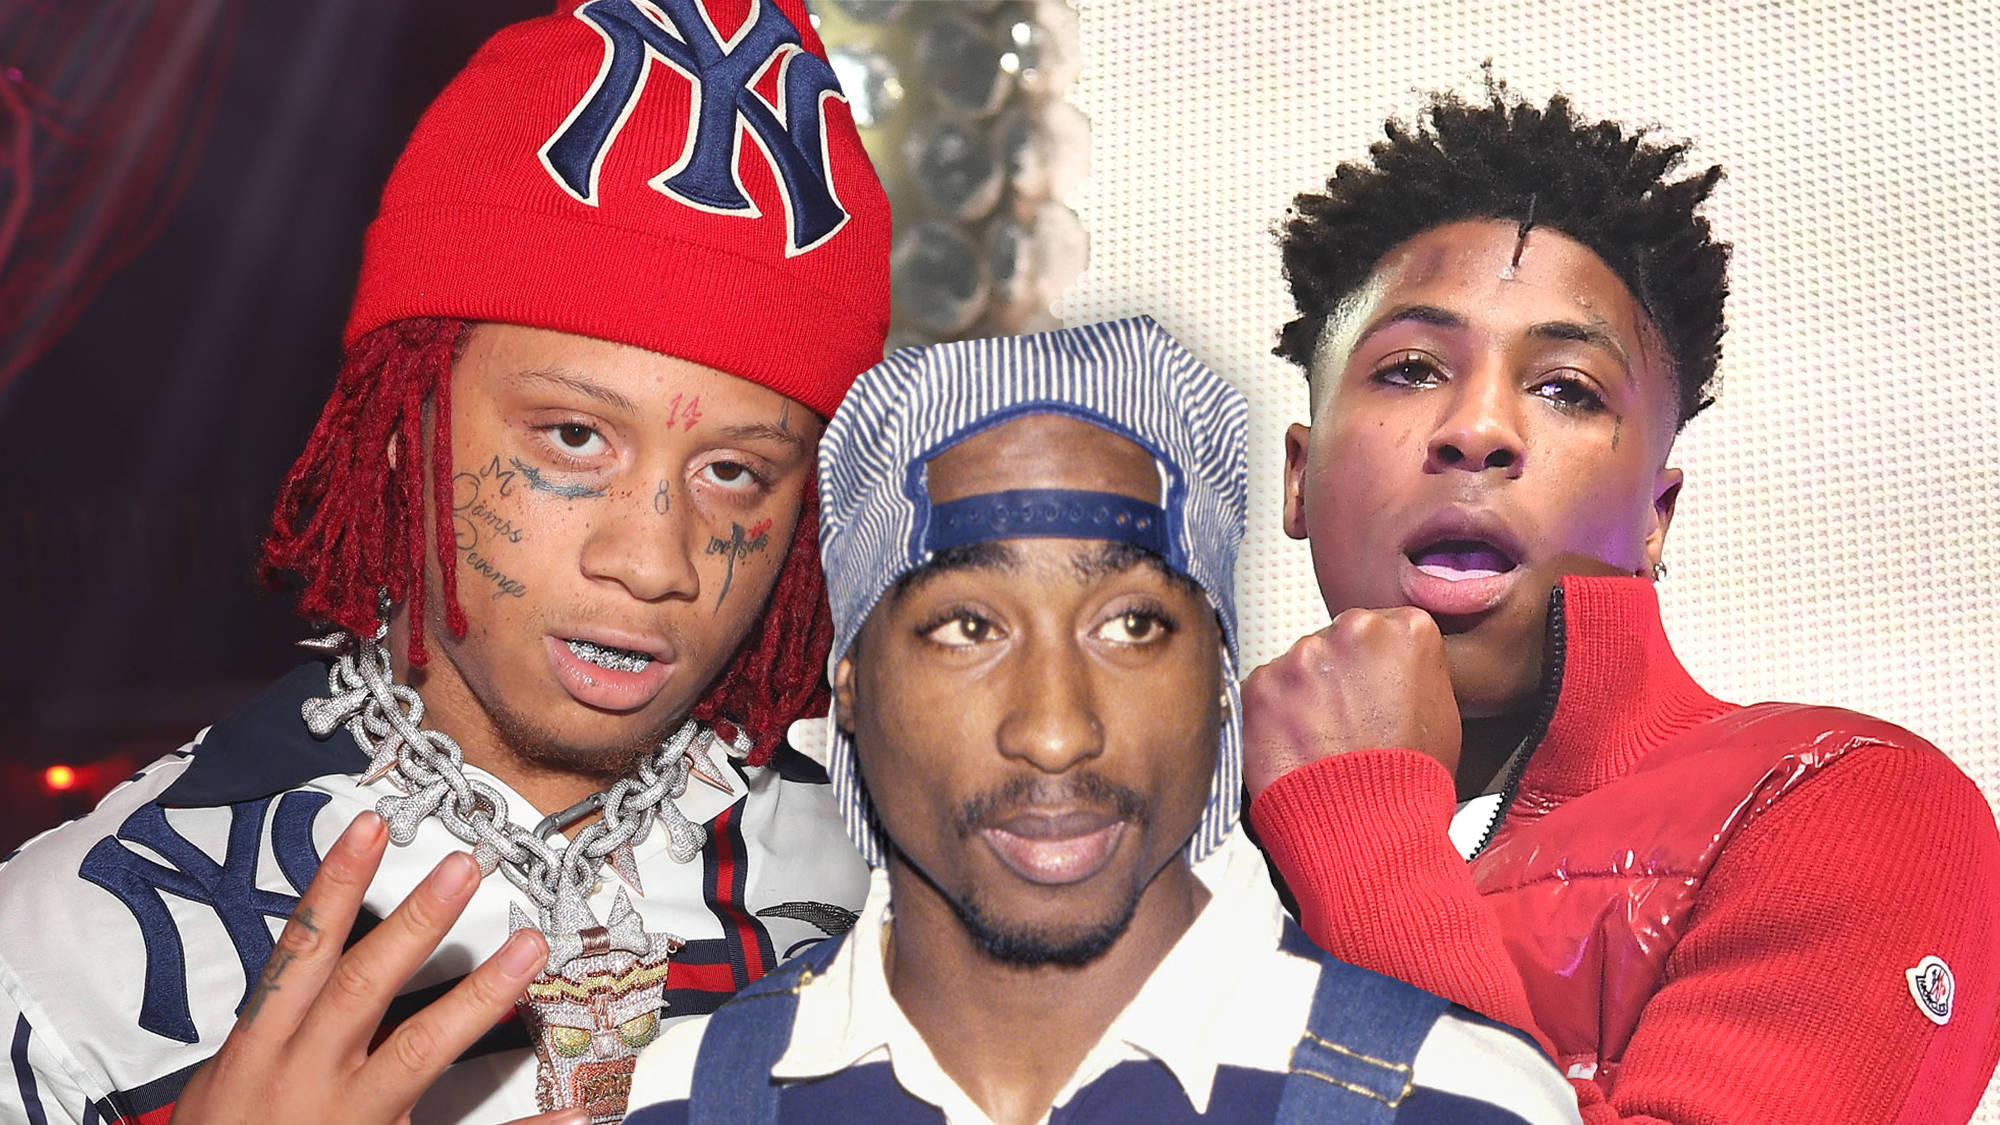 Trippie Redd Claims Rapper NBA Youngboy Is Tupac Shakur